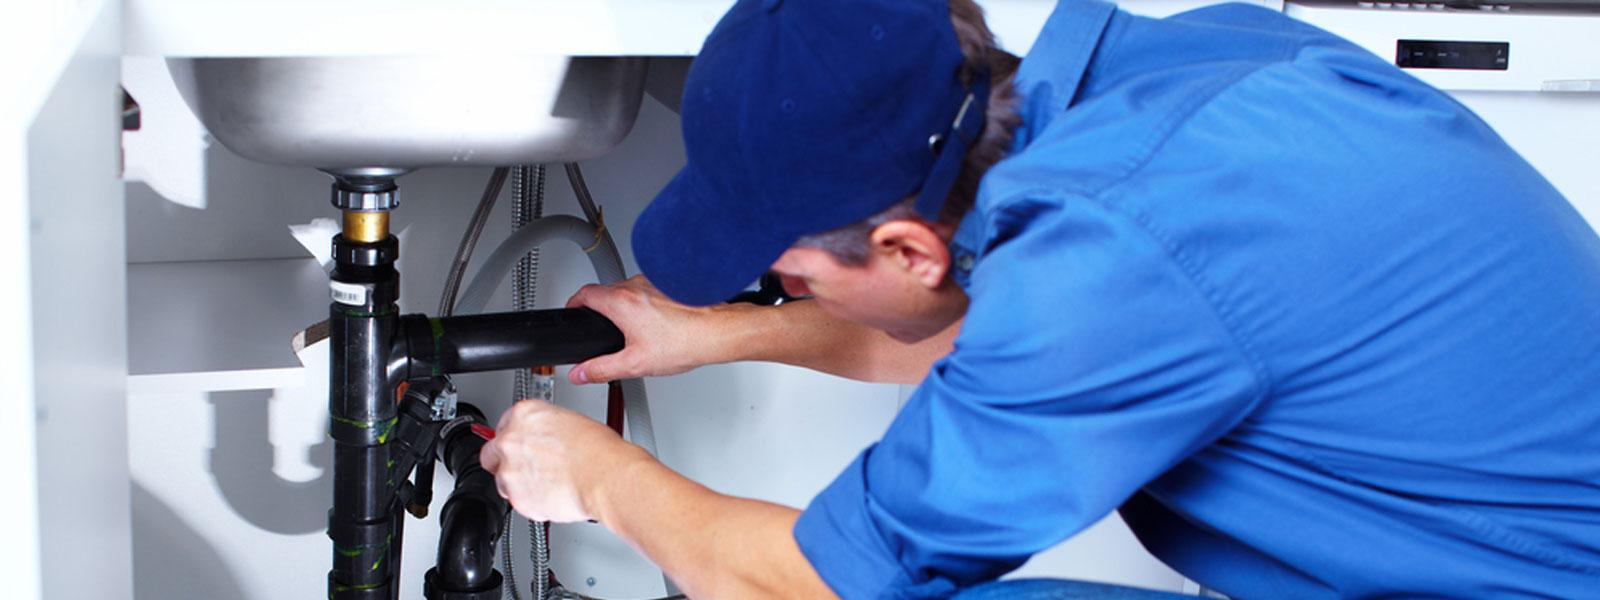 self-employed plumber plumbing in a sink